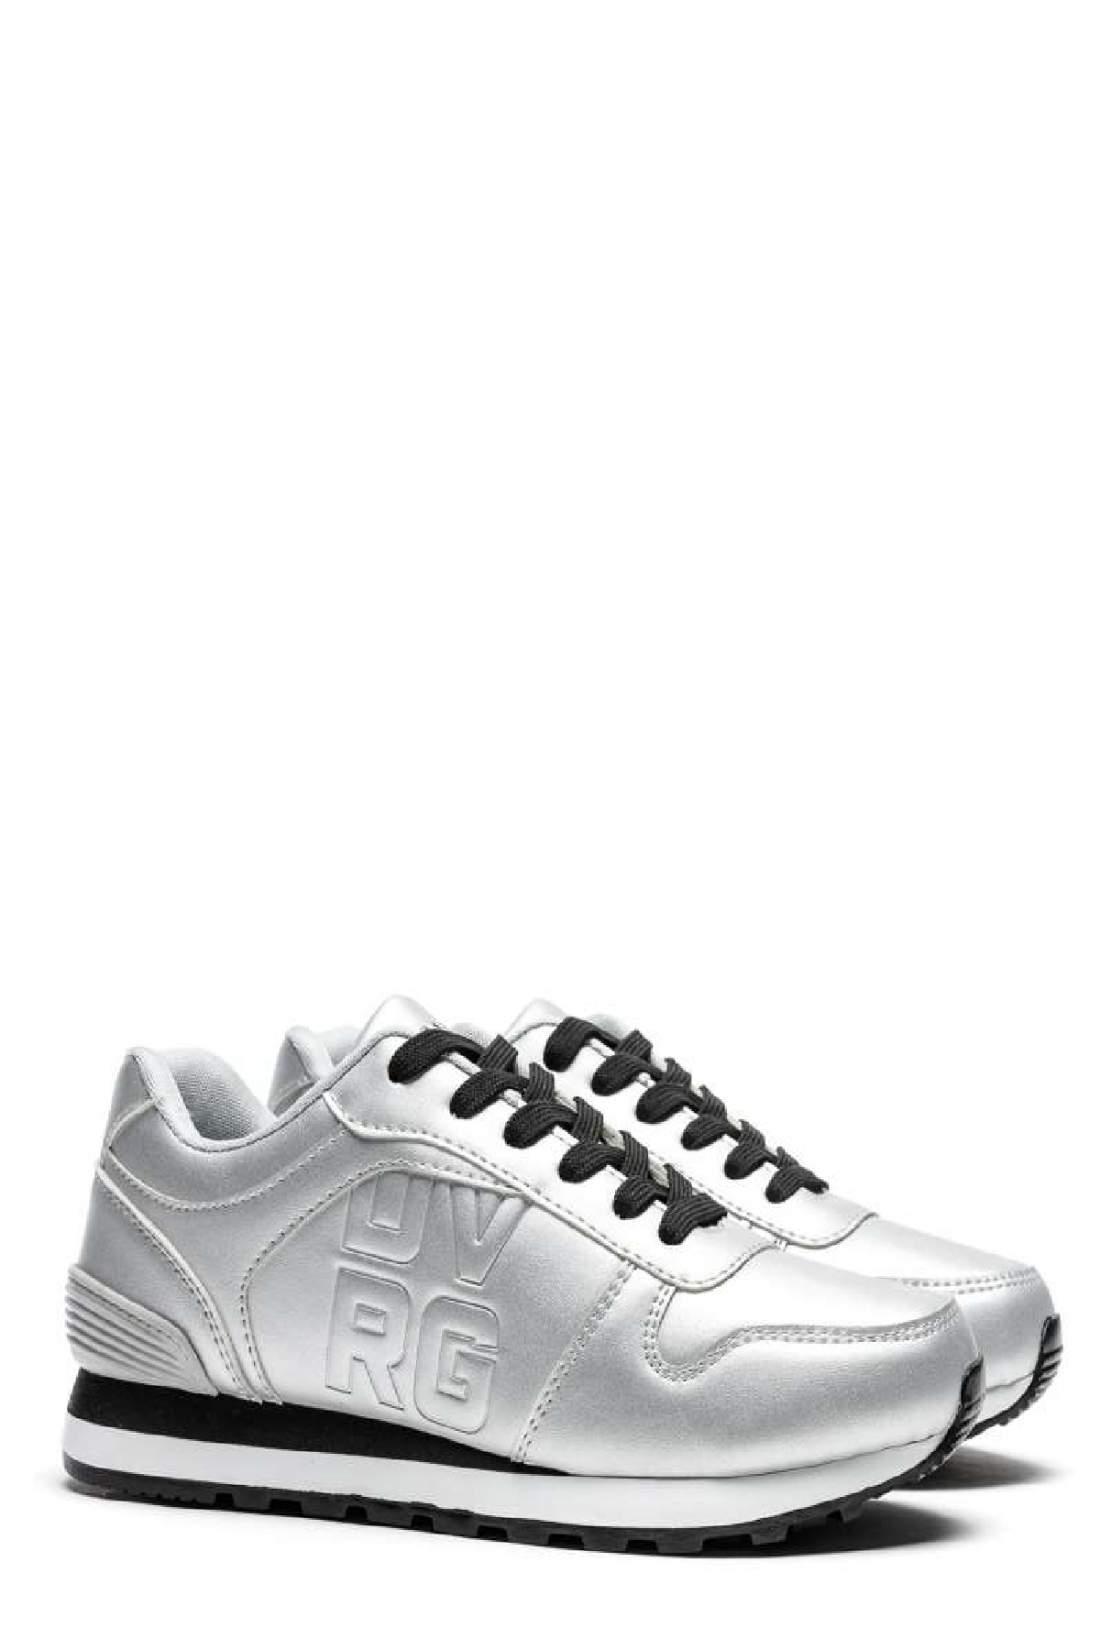 Devergo NIKA PU női sportcipő - Ezüst